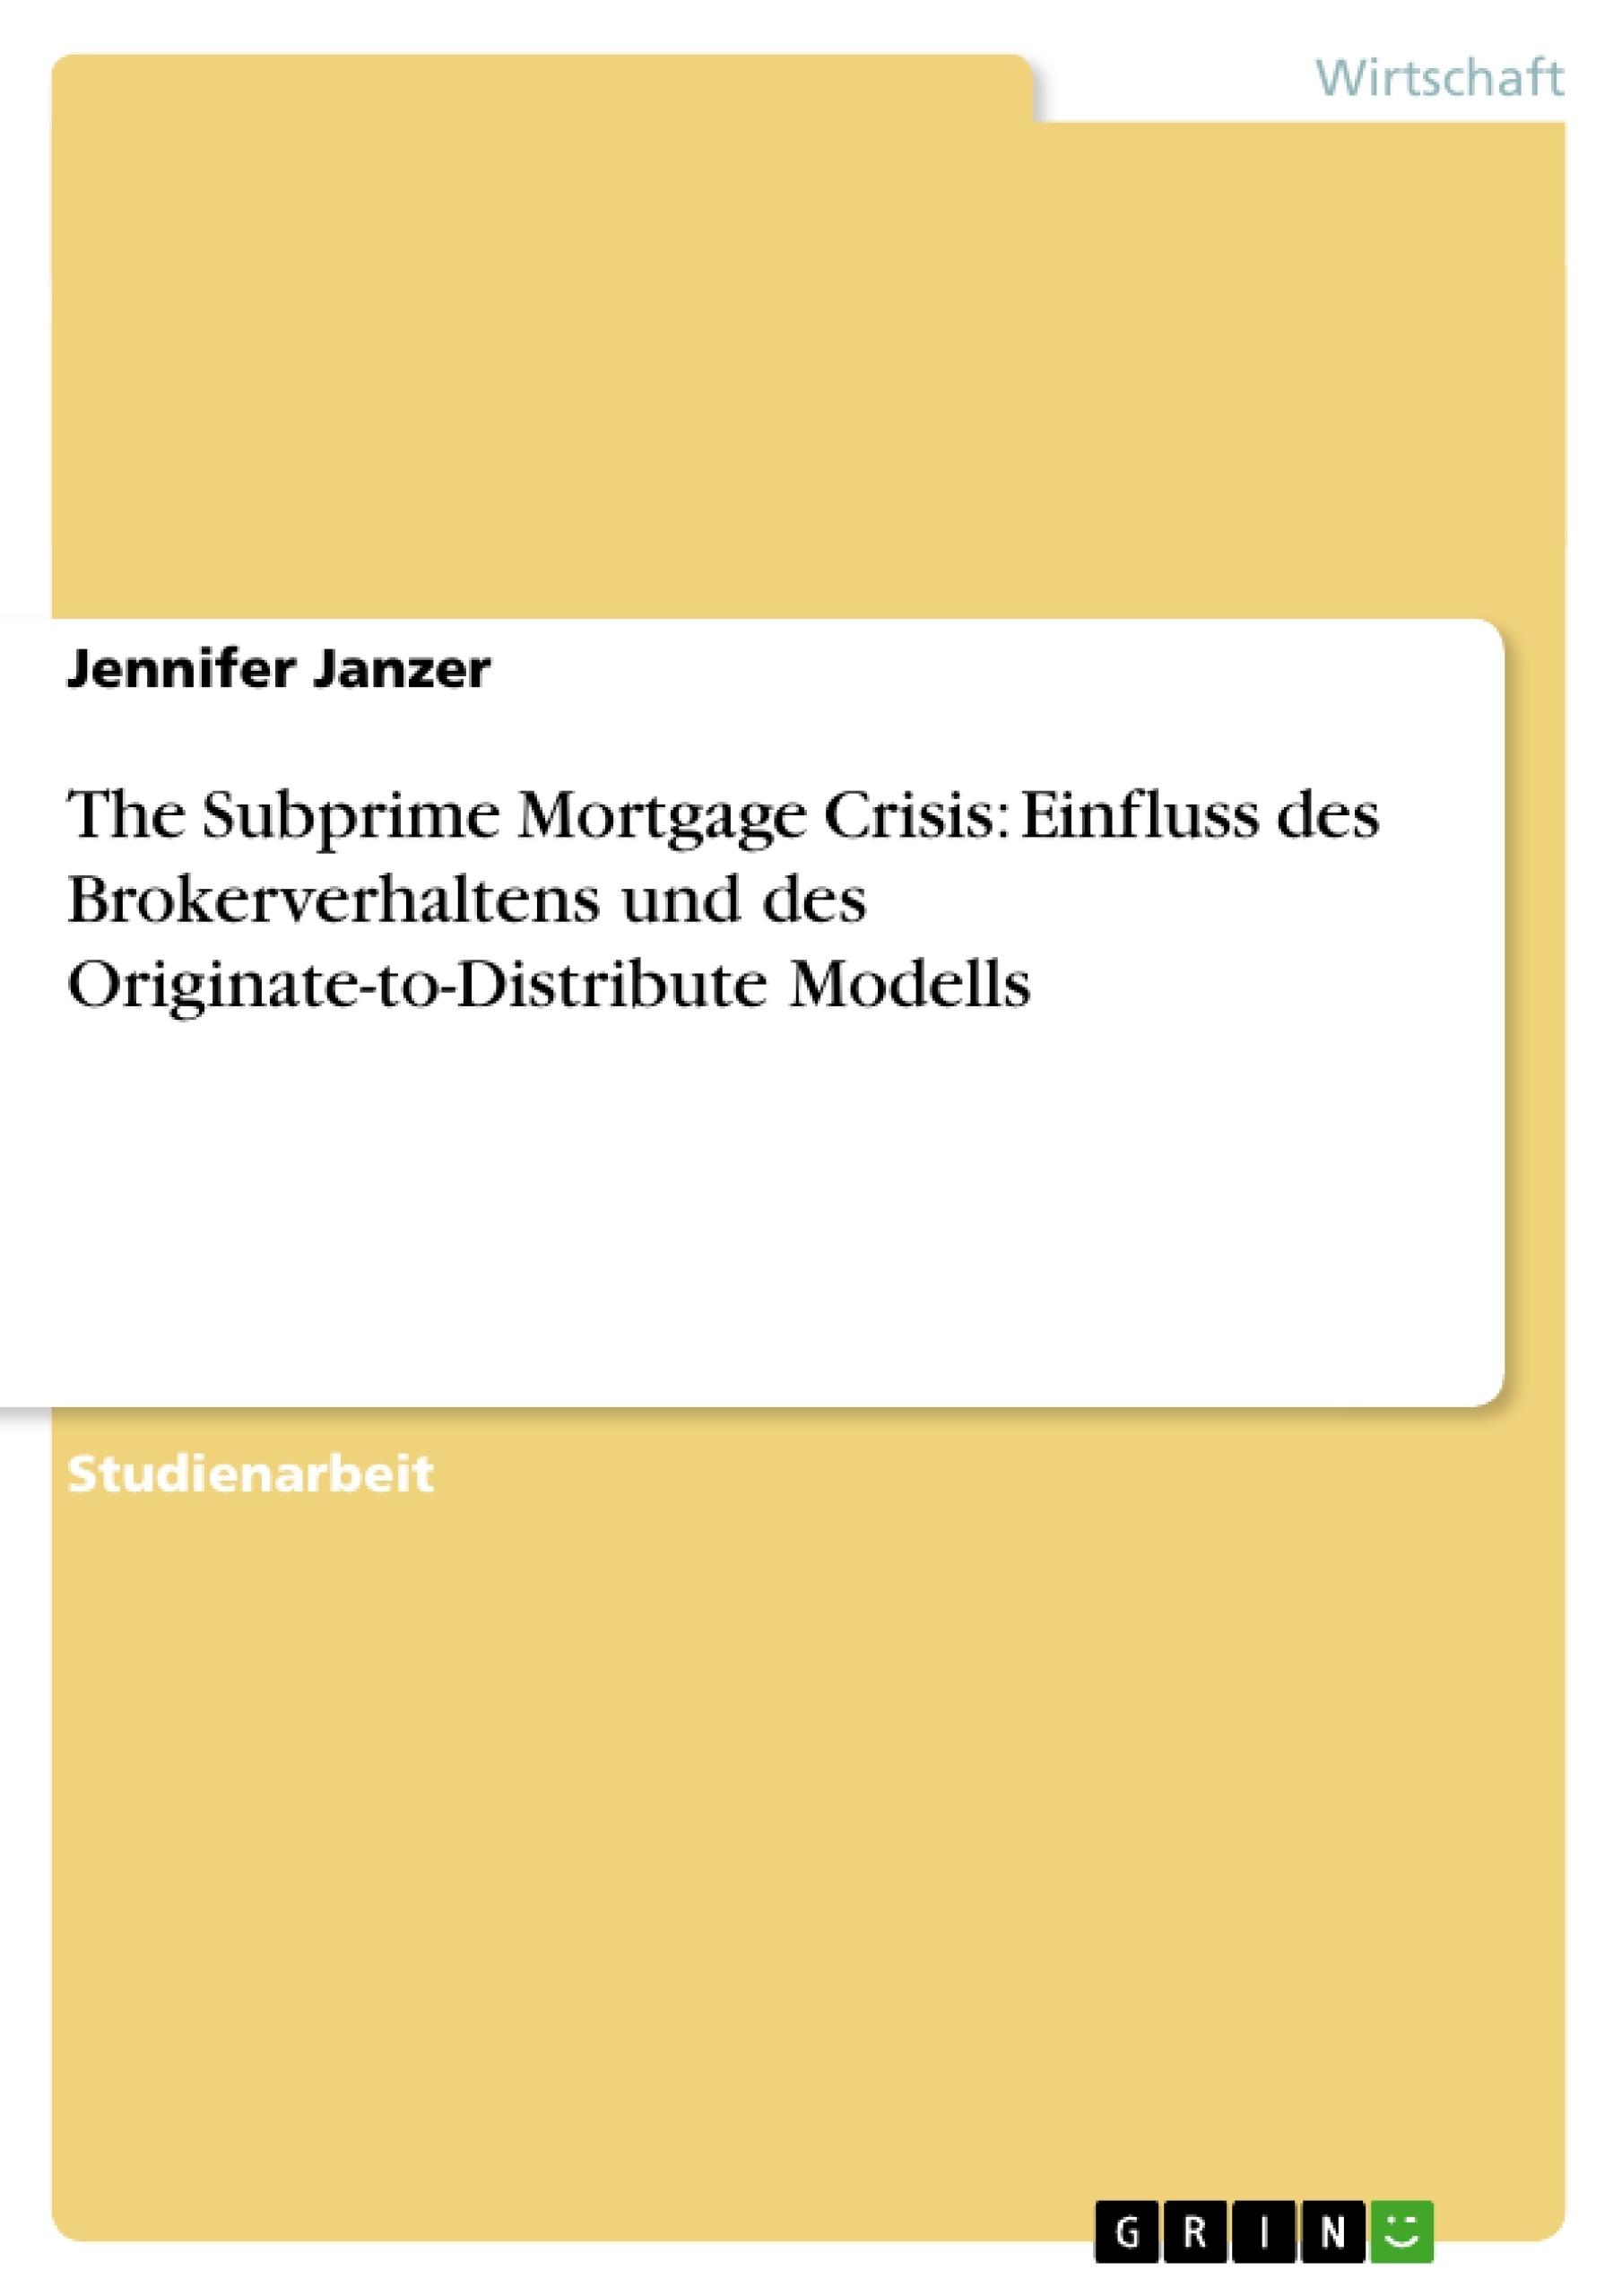 Titel: The Subprime Mortgage Crisis: Einfluss des Brokerverhaltens und des Originate-to-Distribute Modells